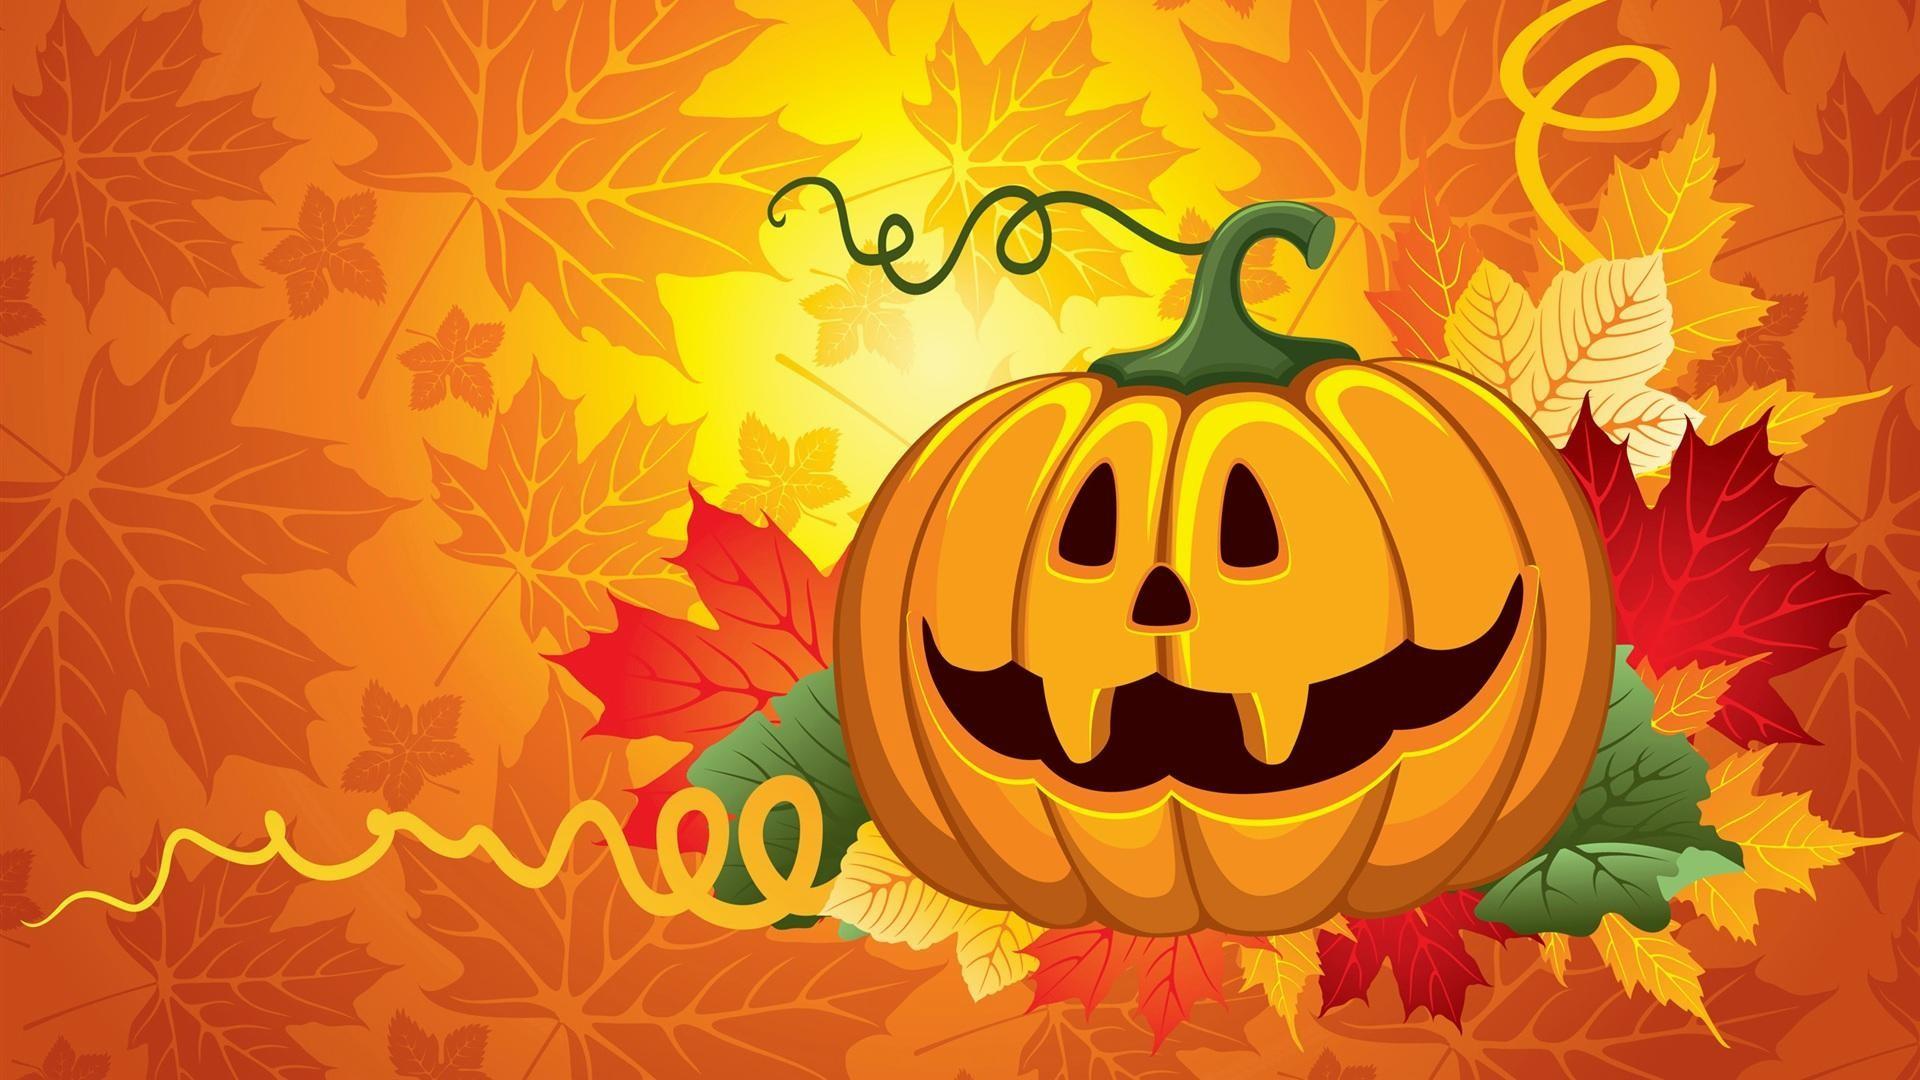 wallpaper.wiki-Wallpaper-of-Pumpkin-Halloween-PIC-WPB008192